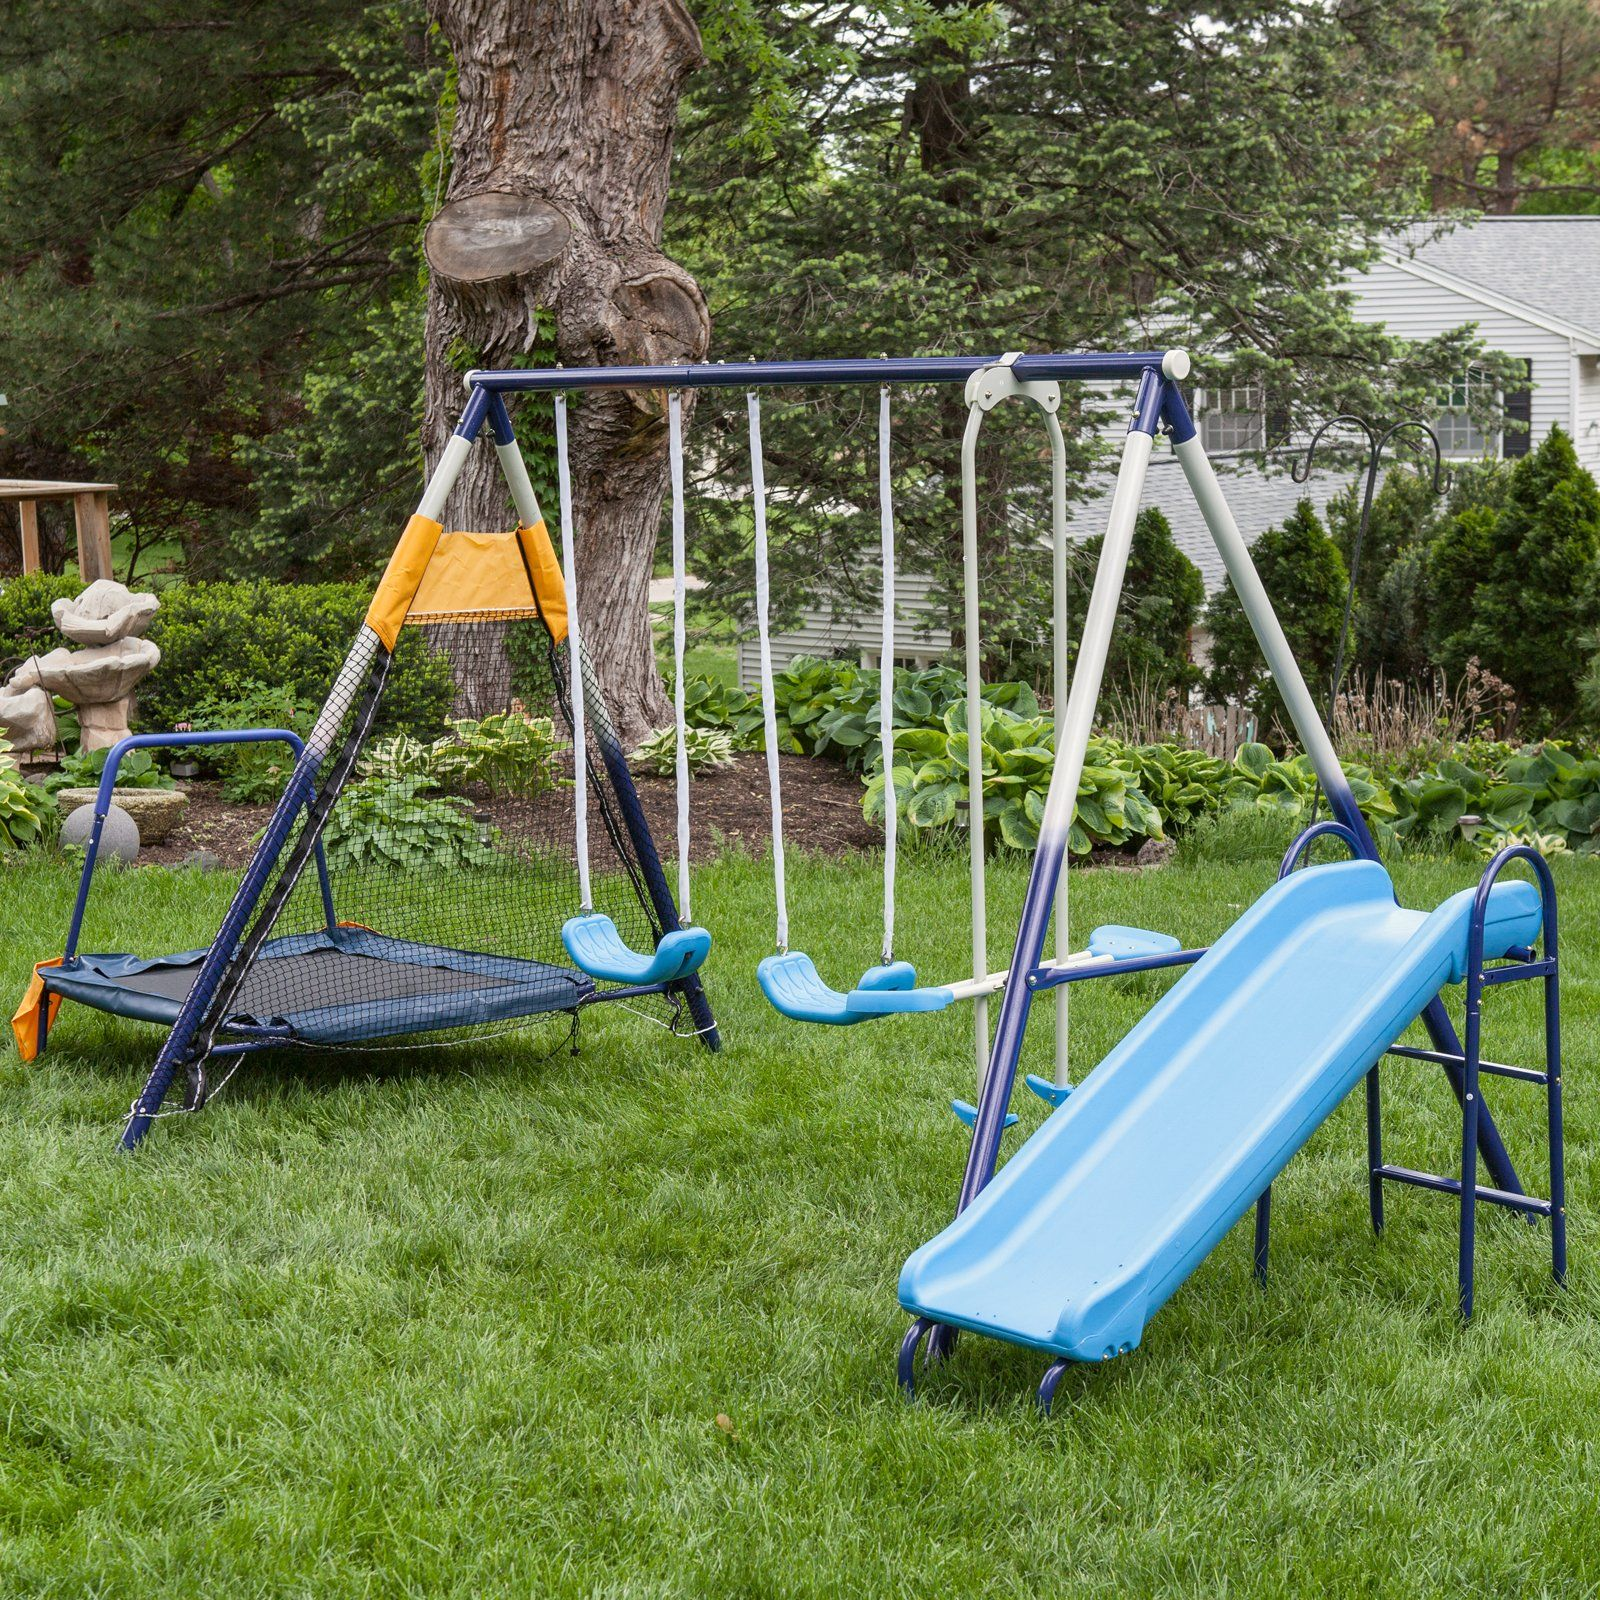 Playtime Toys Swing Sets Hayneedle Com Metal Swing Sets Swing Set Metal Swings